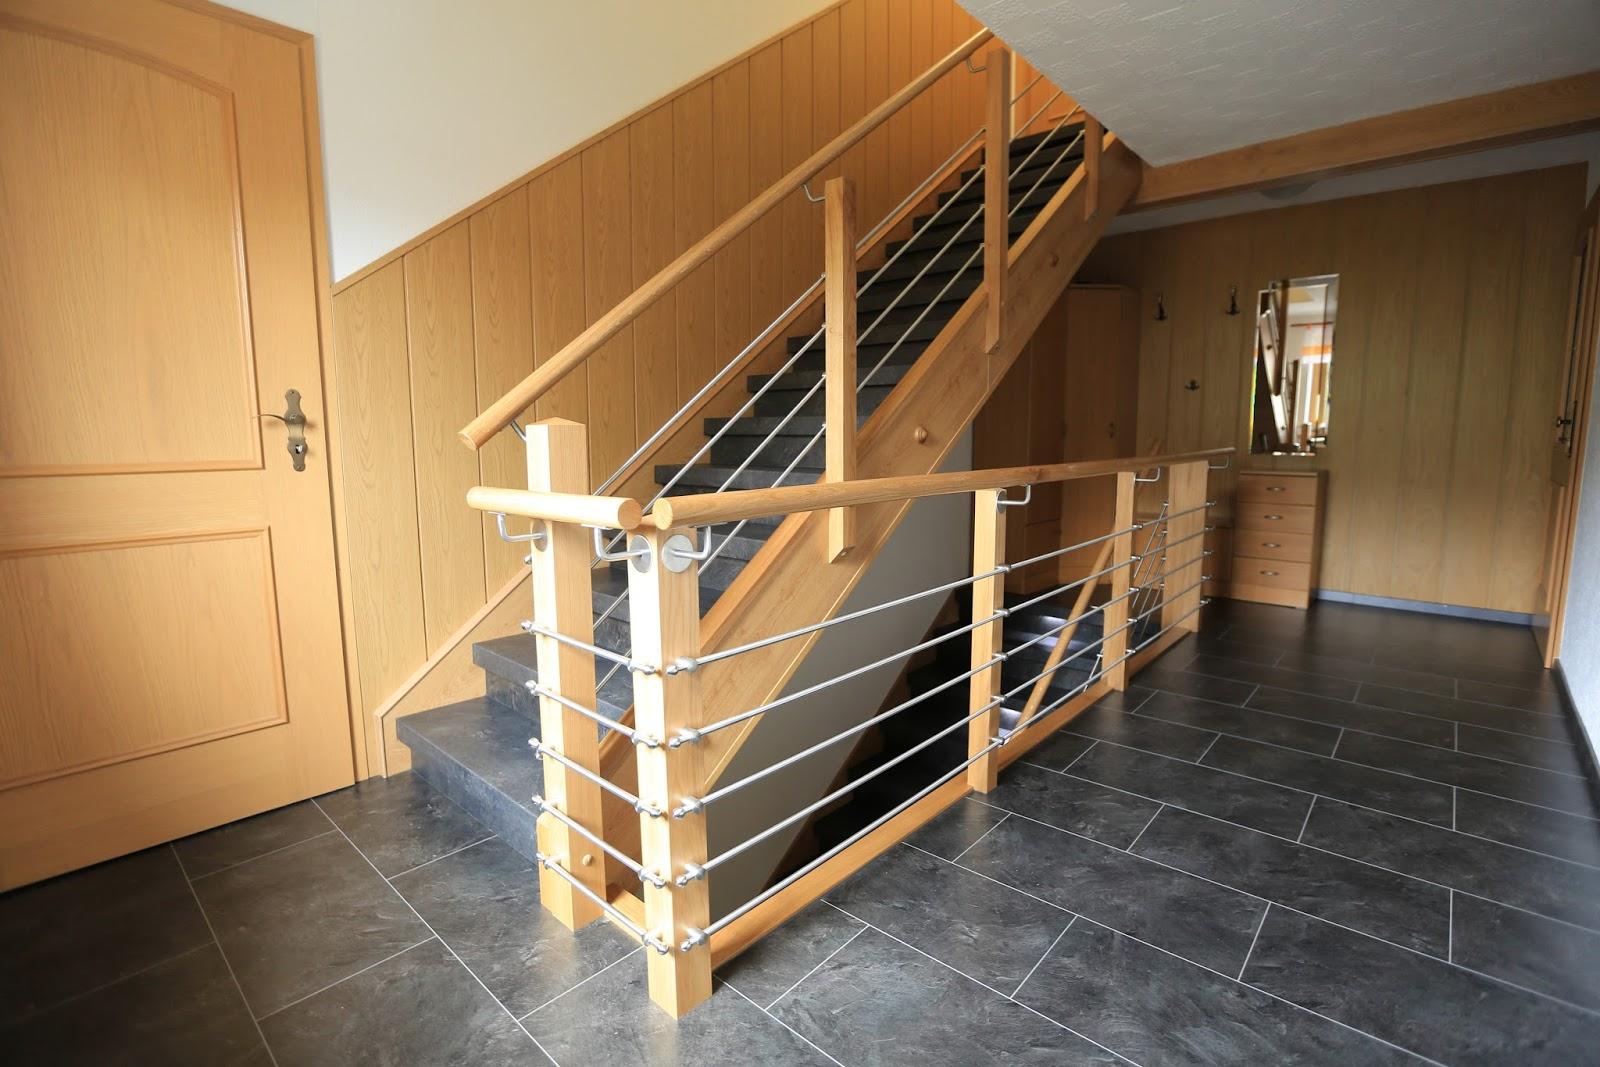 h k treppenrenovierung holztreppengel nder renovieren so geht es richtig. Black Bedroom Furniture Sets. Home Design Ideas